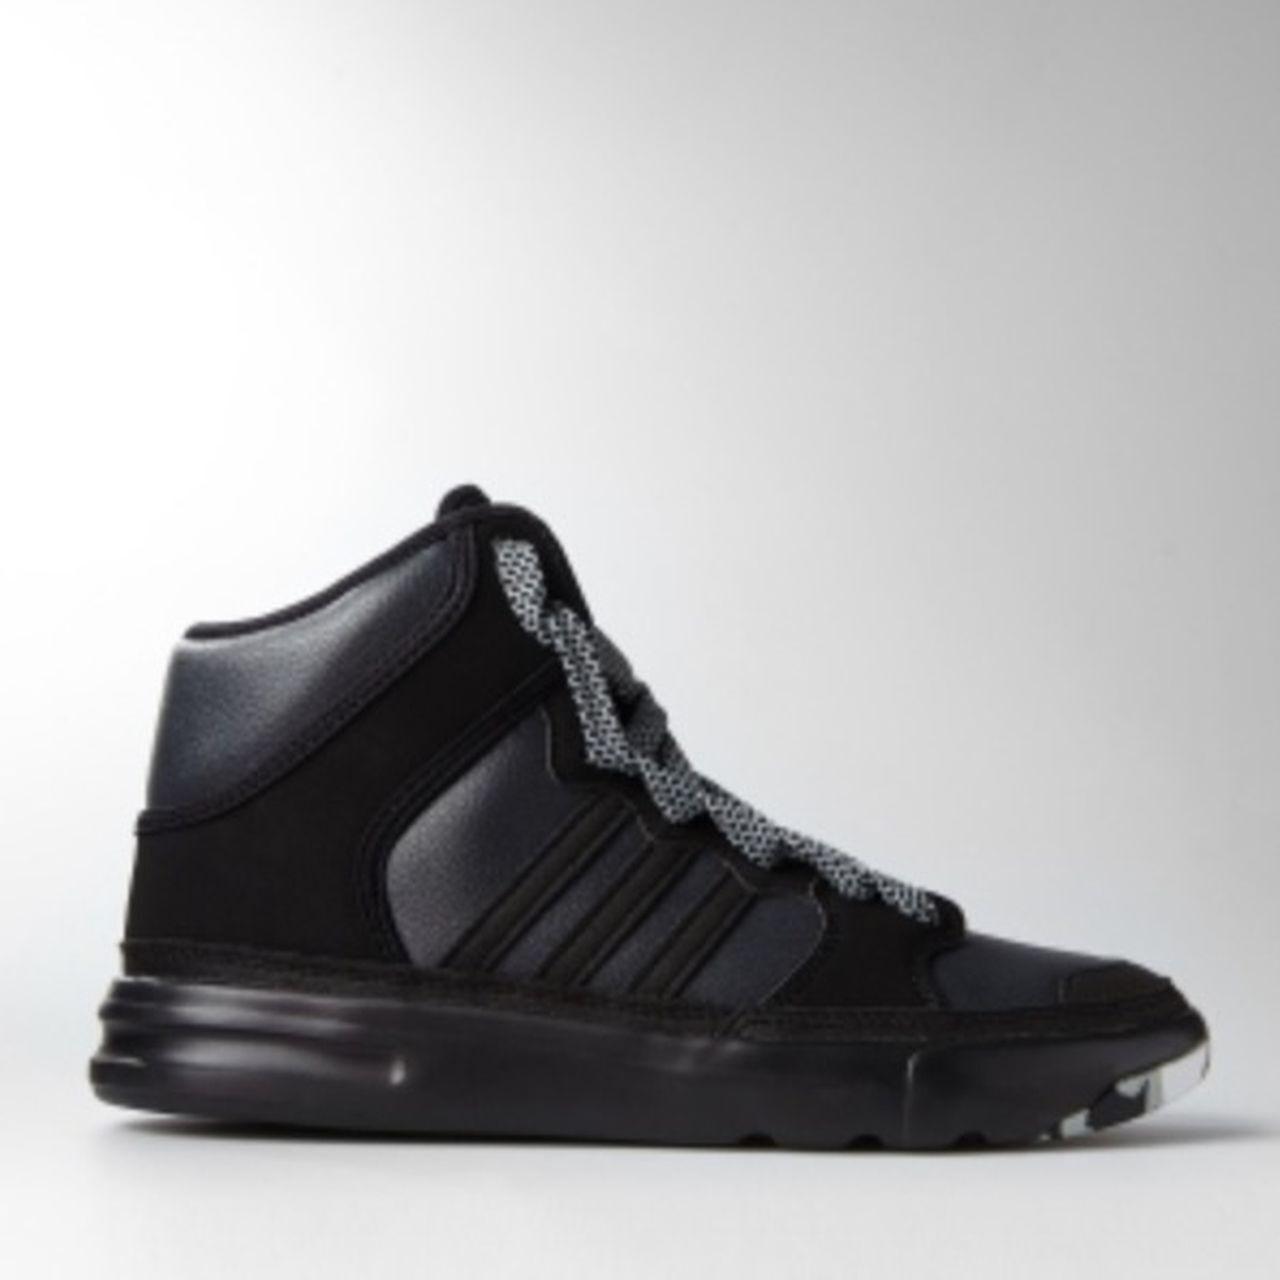 Adidas STELLASPORT Women's Irana shoes Size 6 us B33320 LAST PAIR